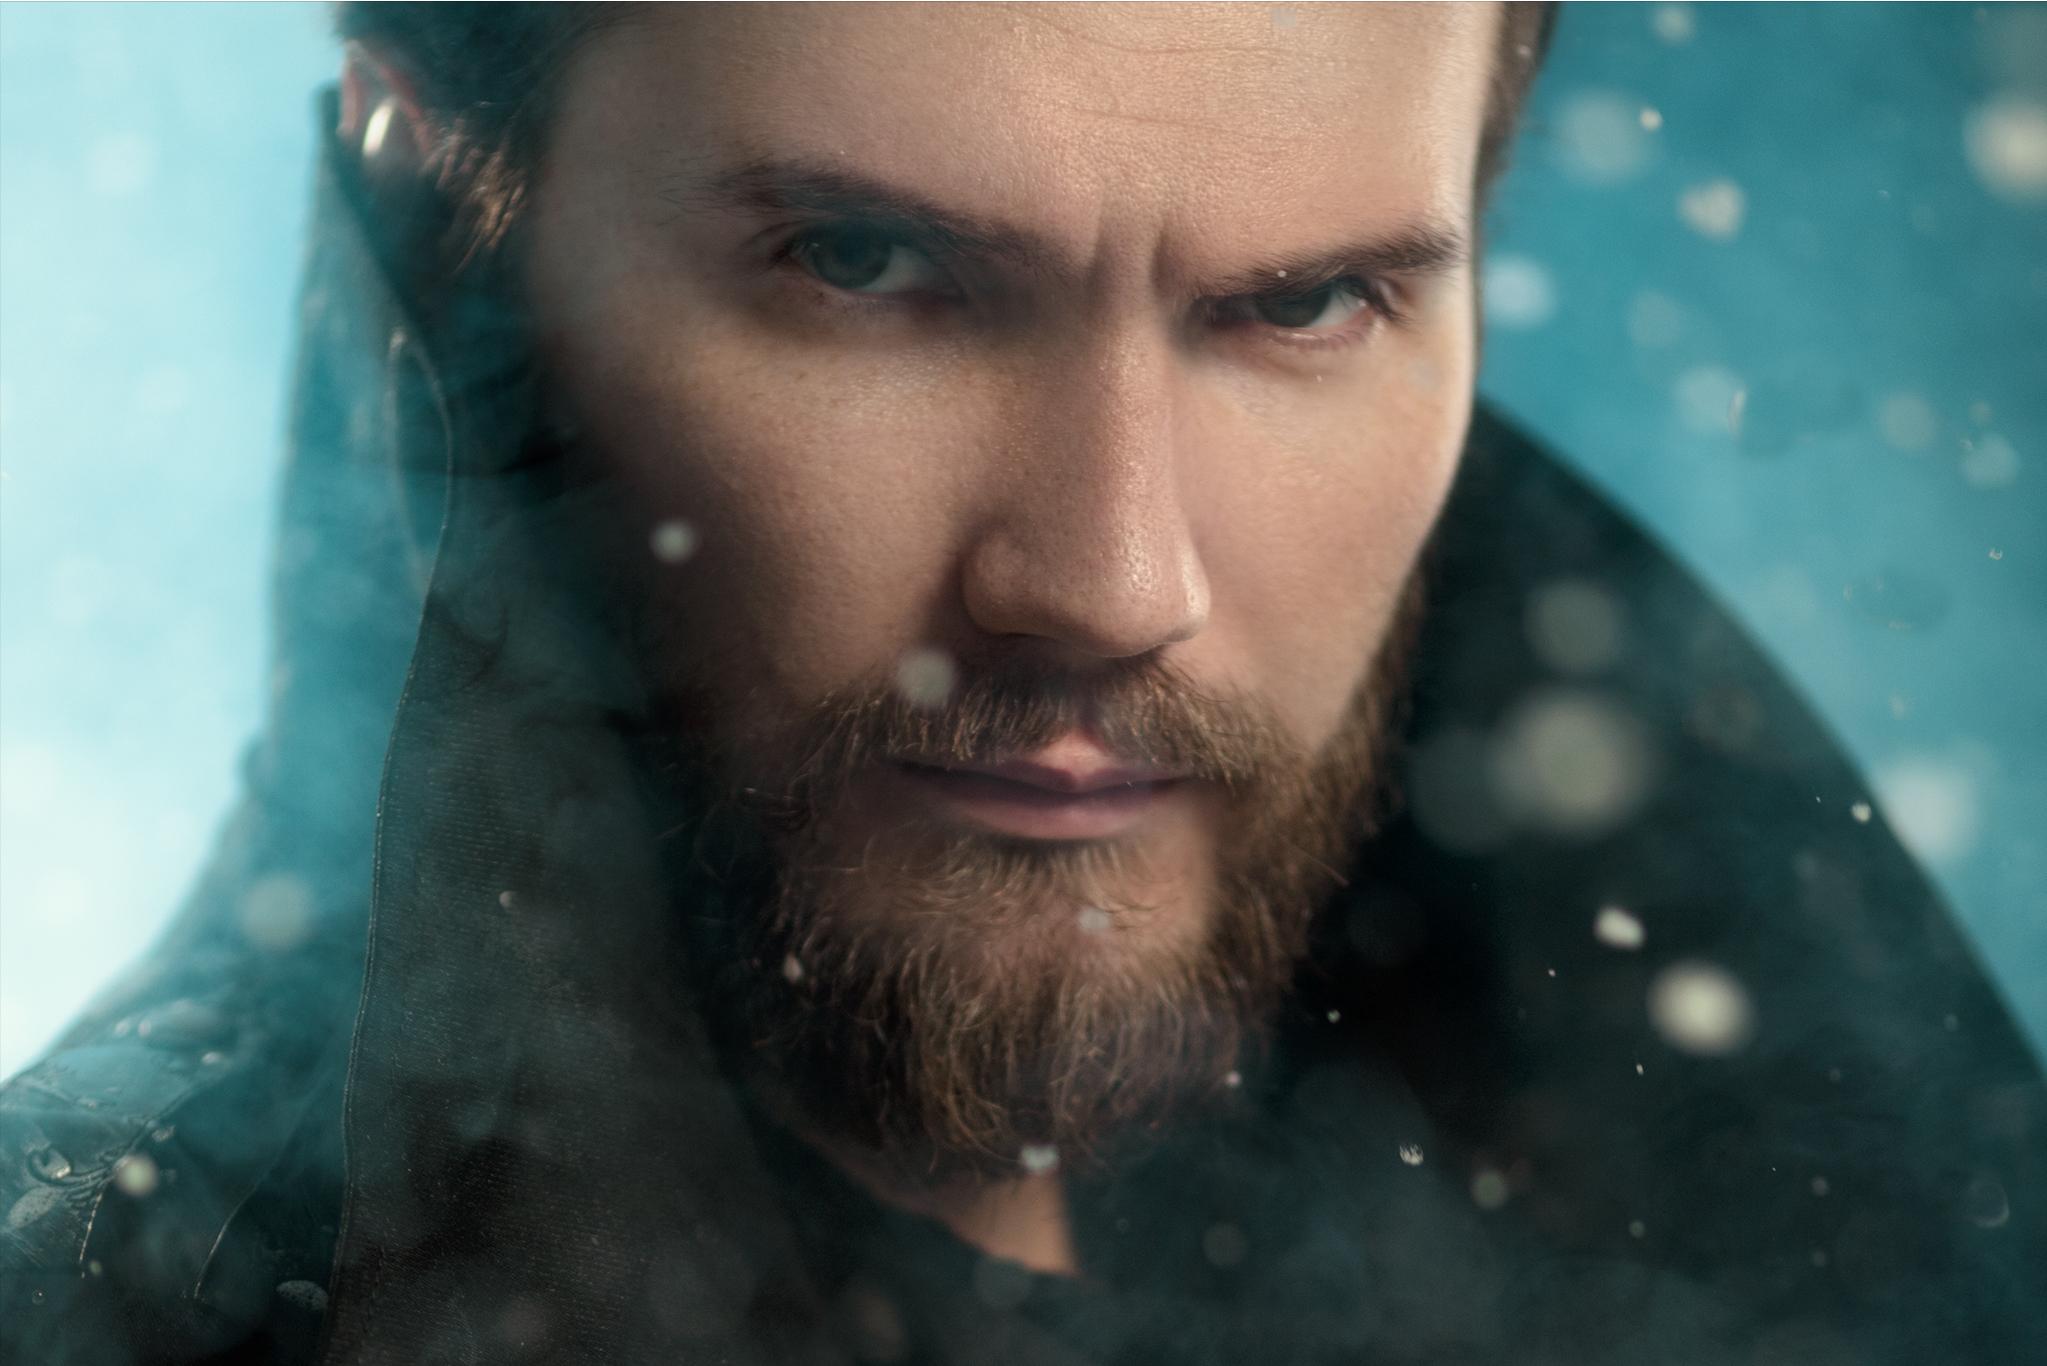 actor-andreisatalov-andreinova-london-bartoszbranka-photographer-movie-film-portrait-beard-bearded-man-acting-producer-director